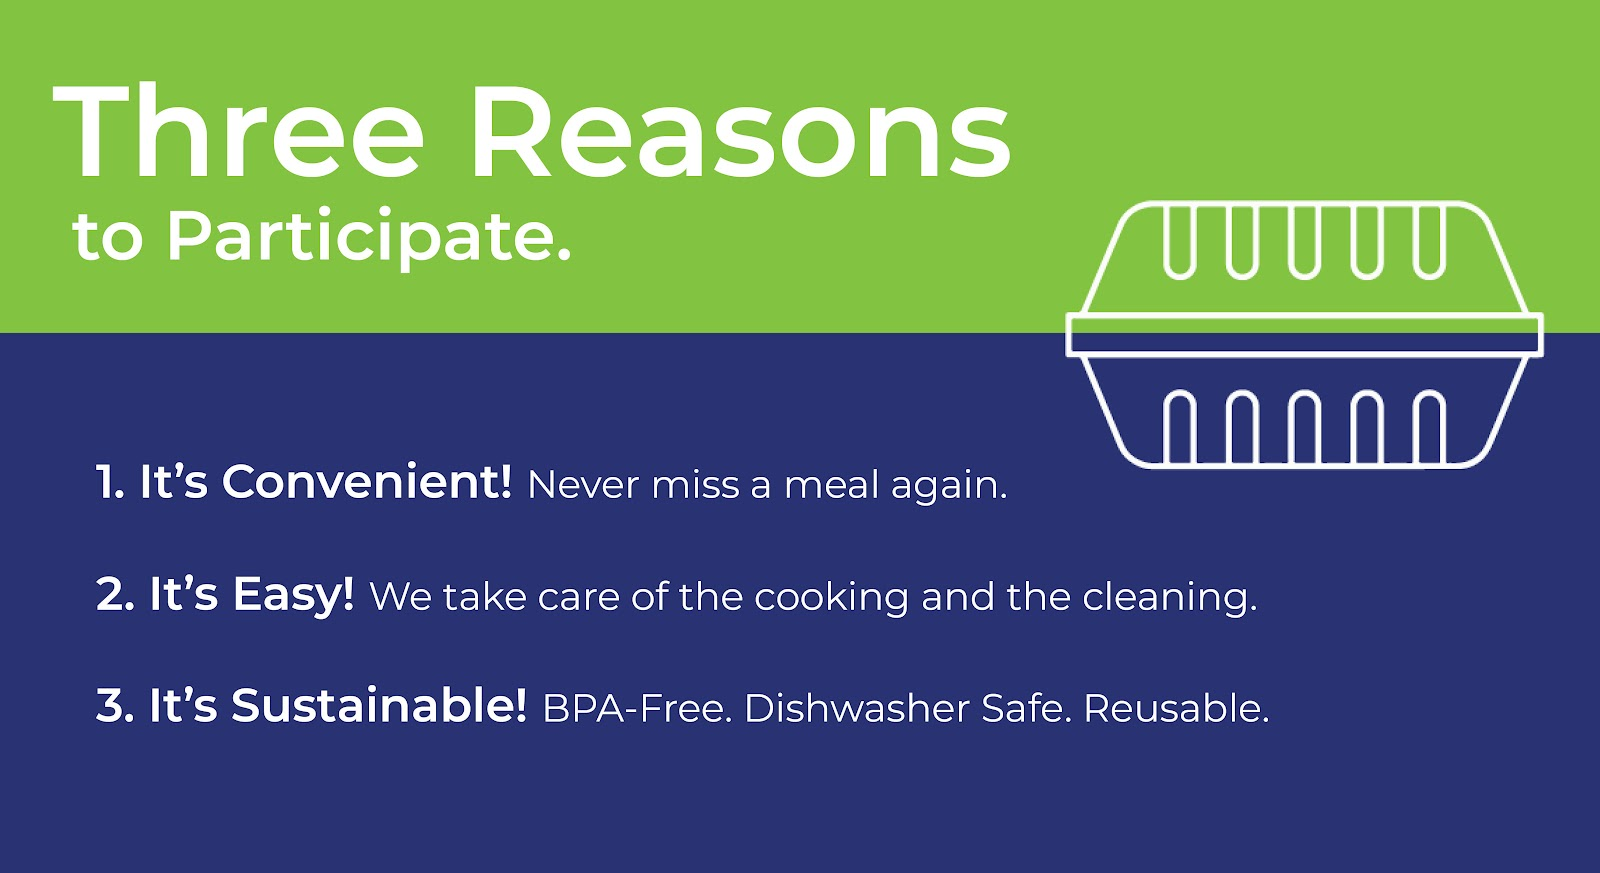 It's Convenient. It's Easy. It's Sustainable.